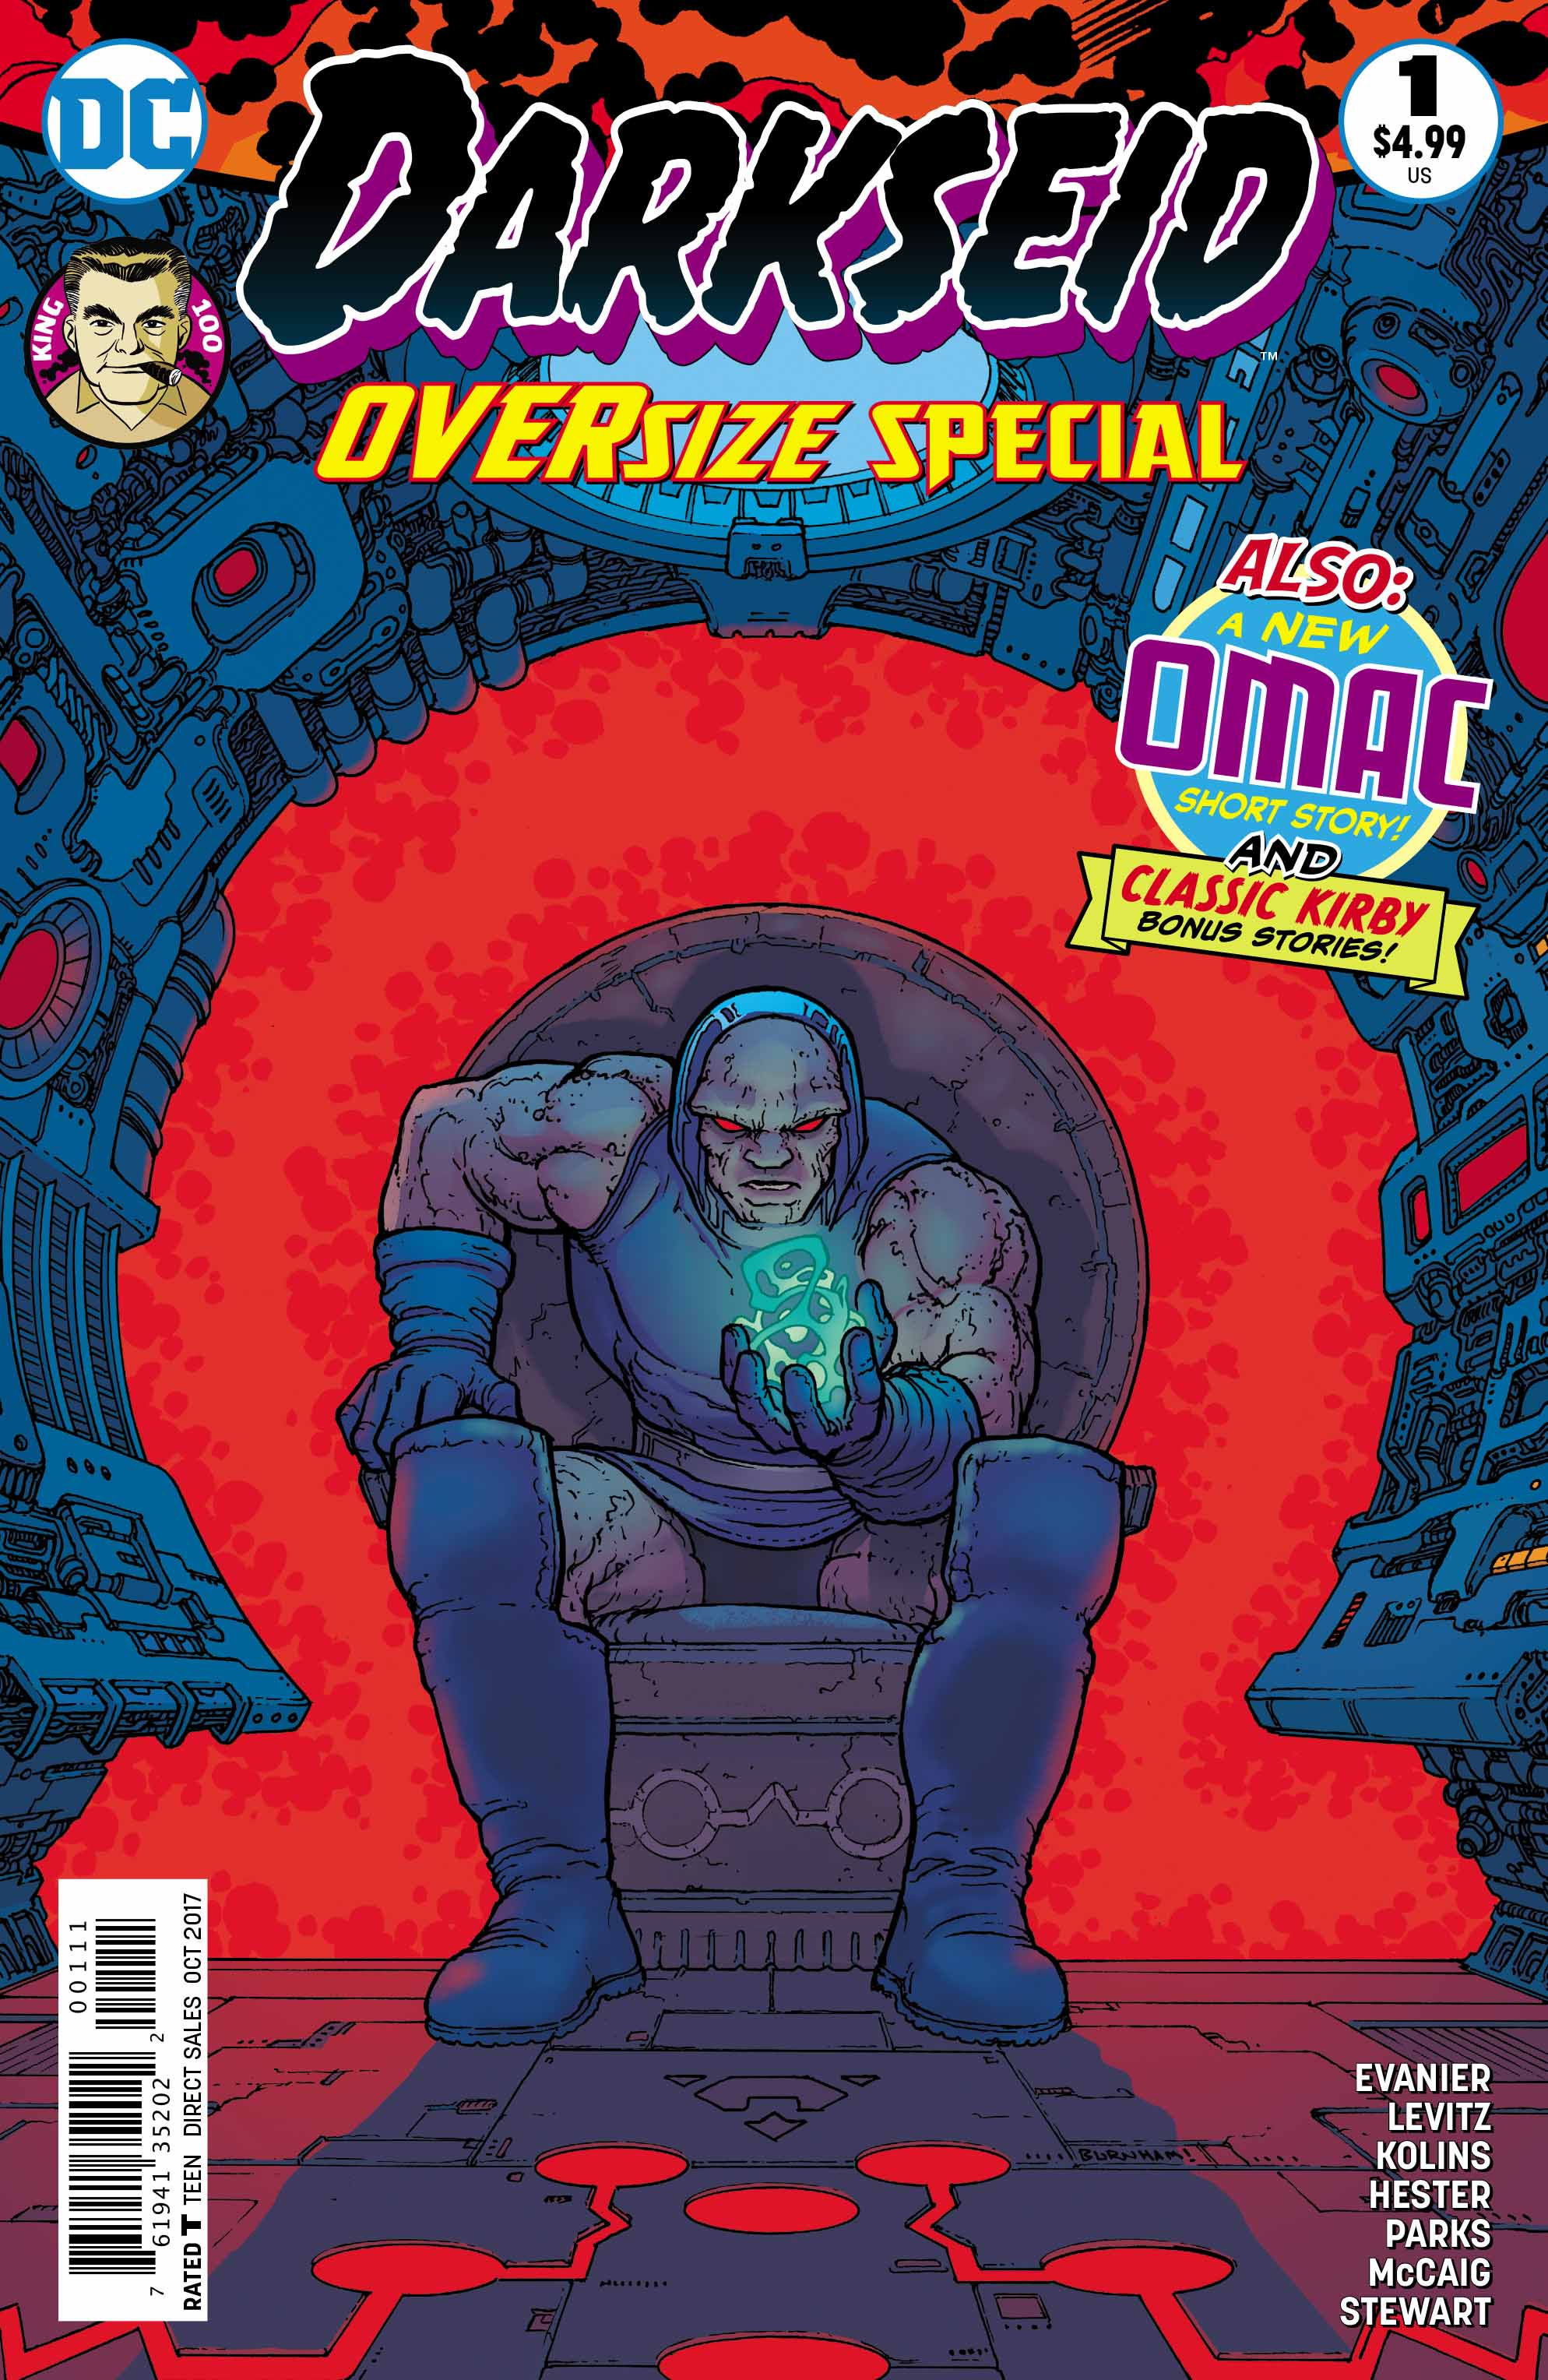 Darkseid Cover - DC Comics News